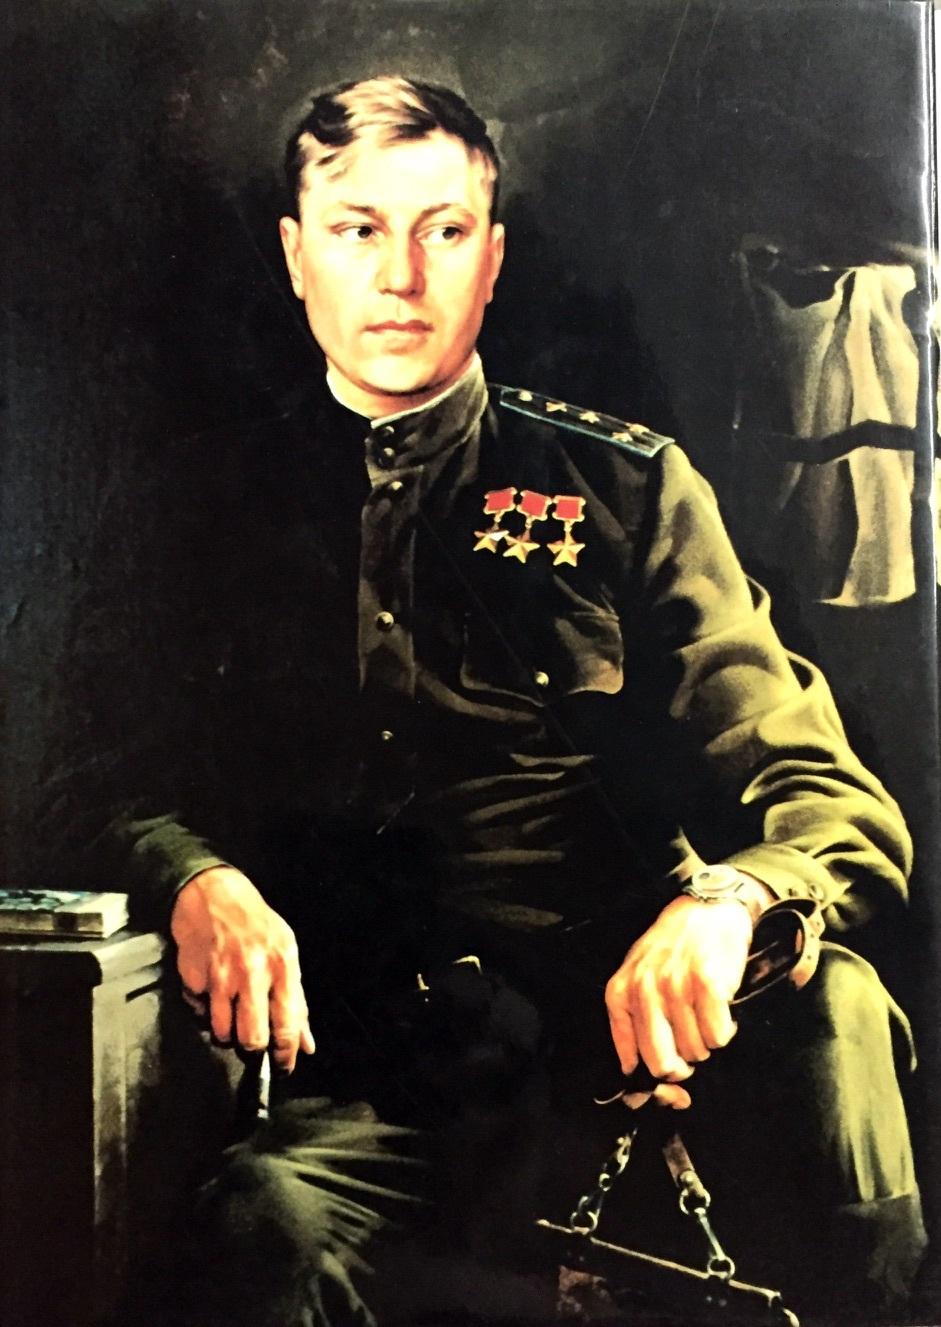 Юрий Сергеевич Устинов. Александр Покрышкин. Фотолетопись